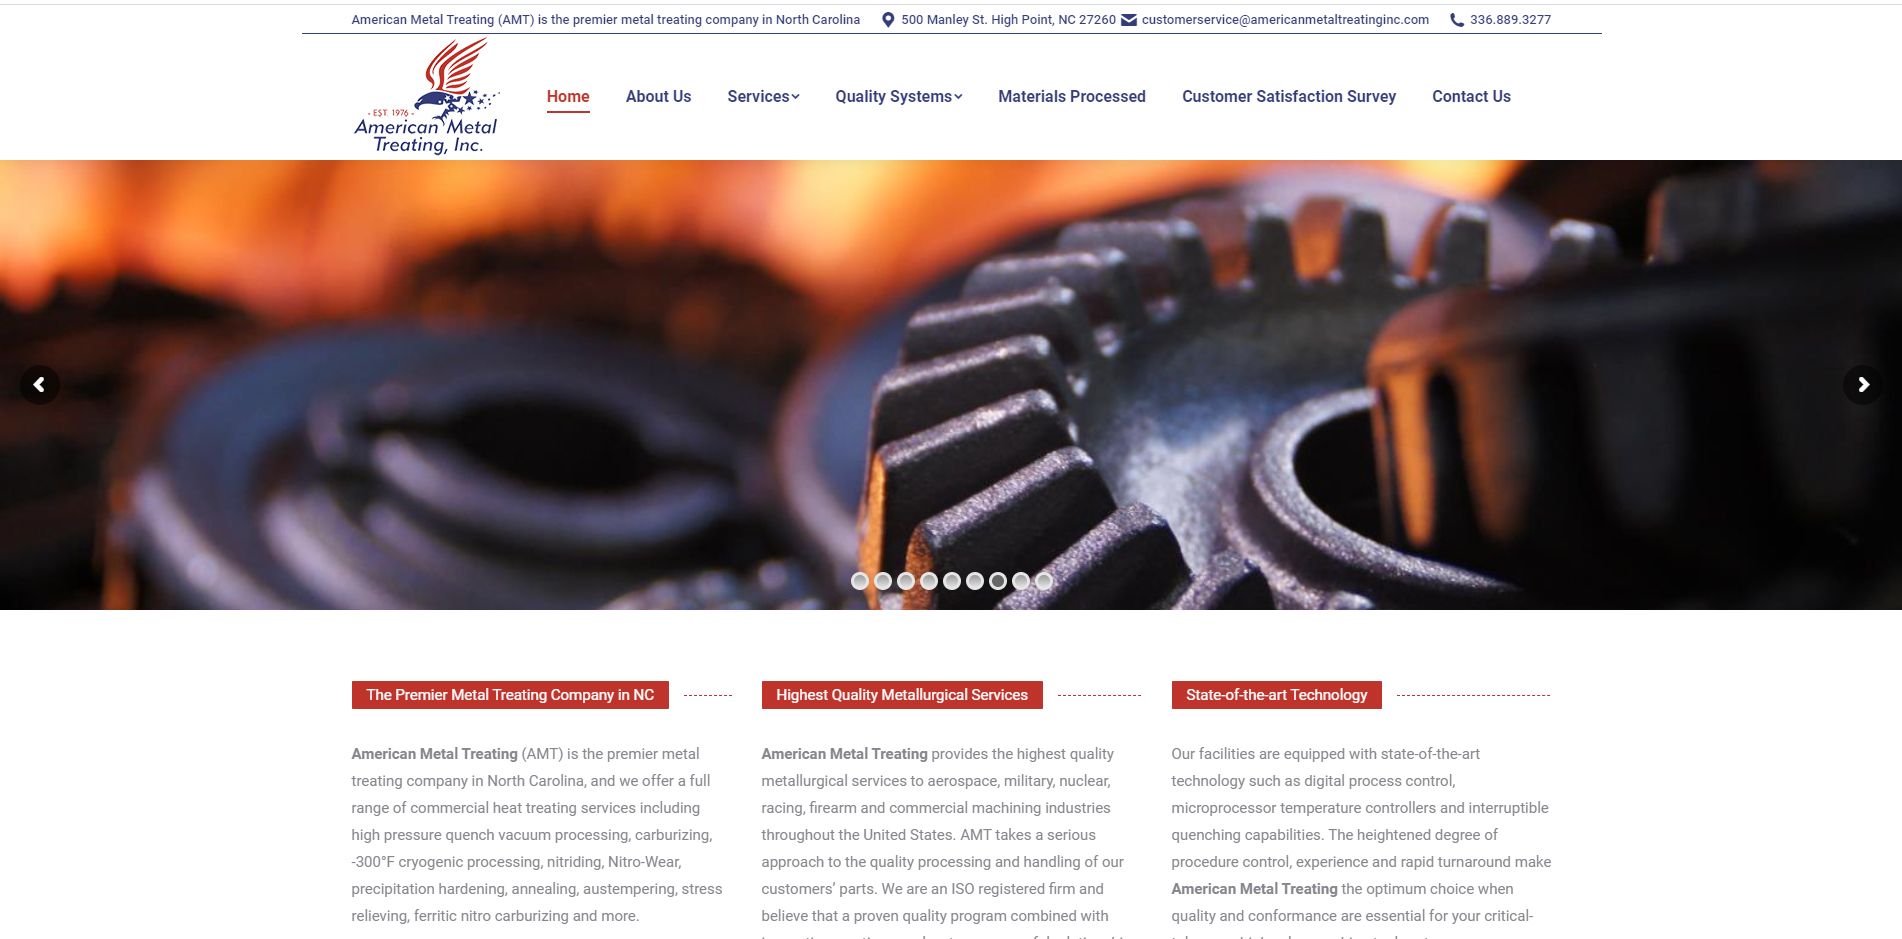 American Metal Treating High Point, NC | Pinwilz - Unifiweb Website